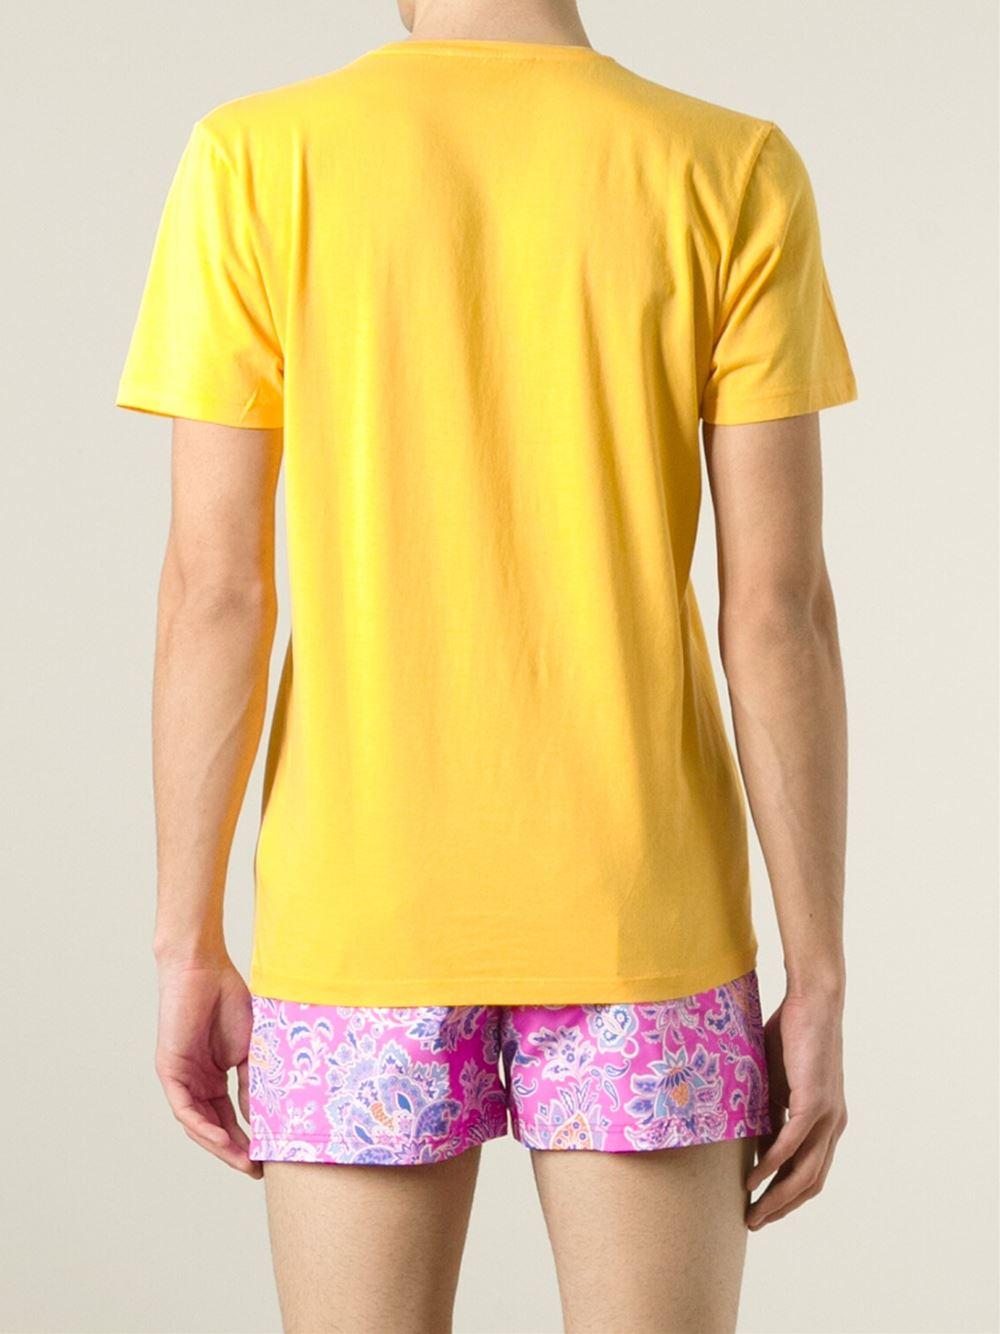 Lyst Etro Fish Print T Shirt In Yellow For Men